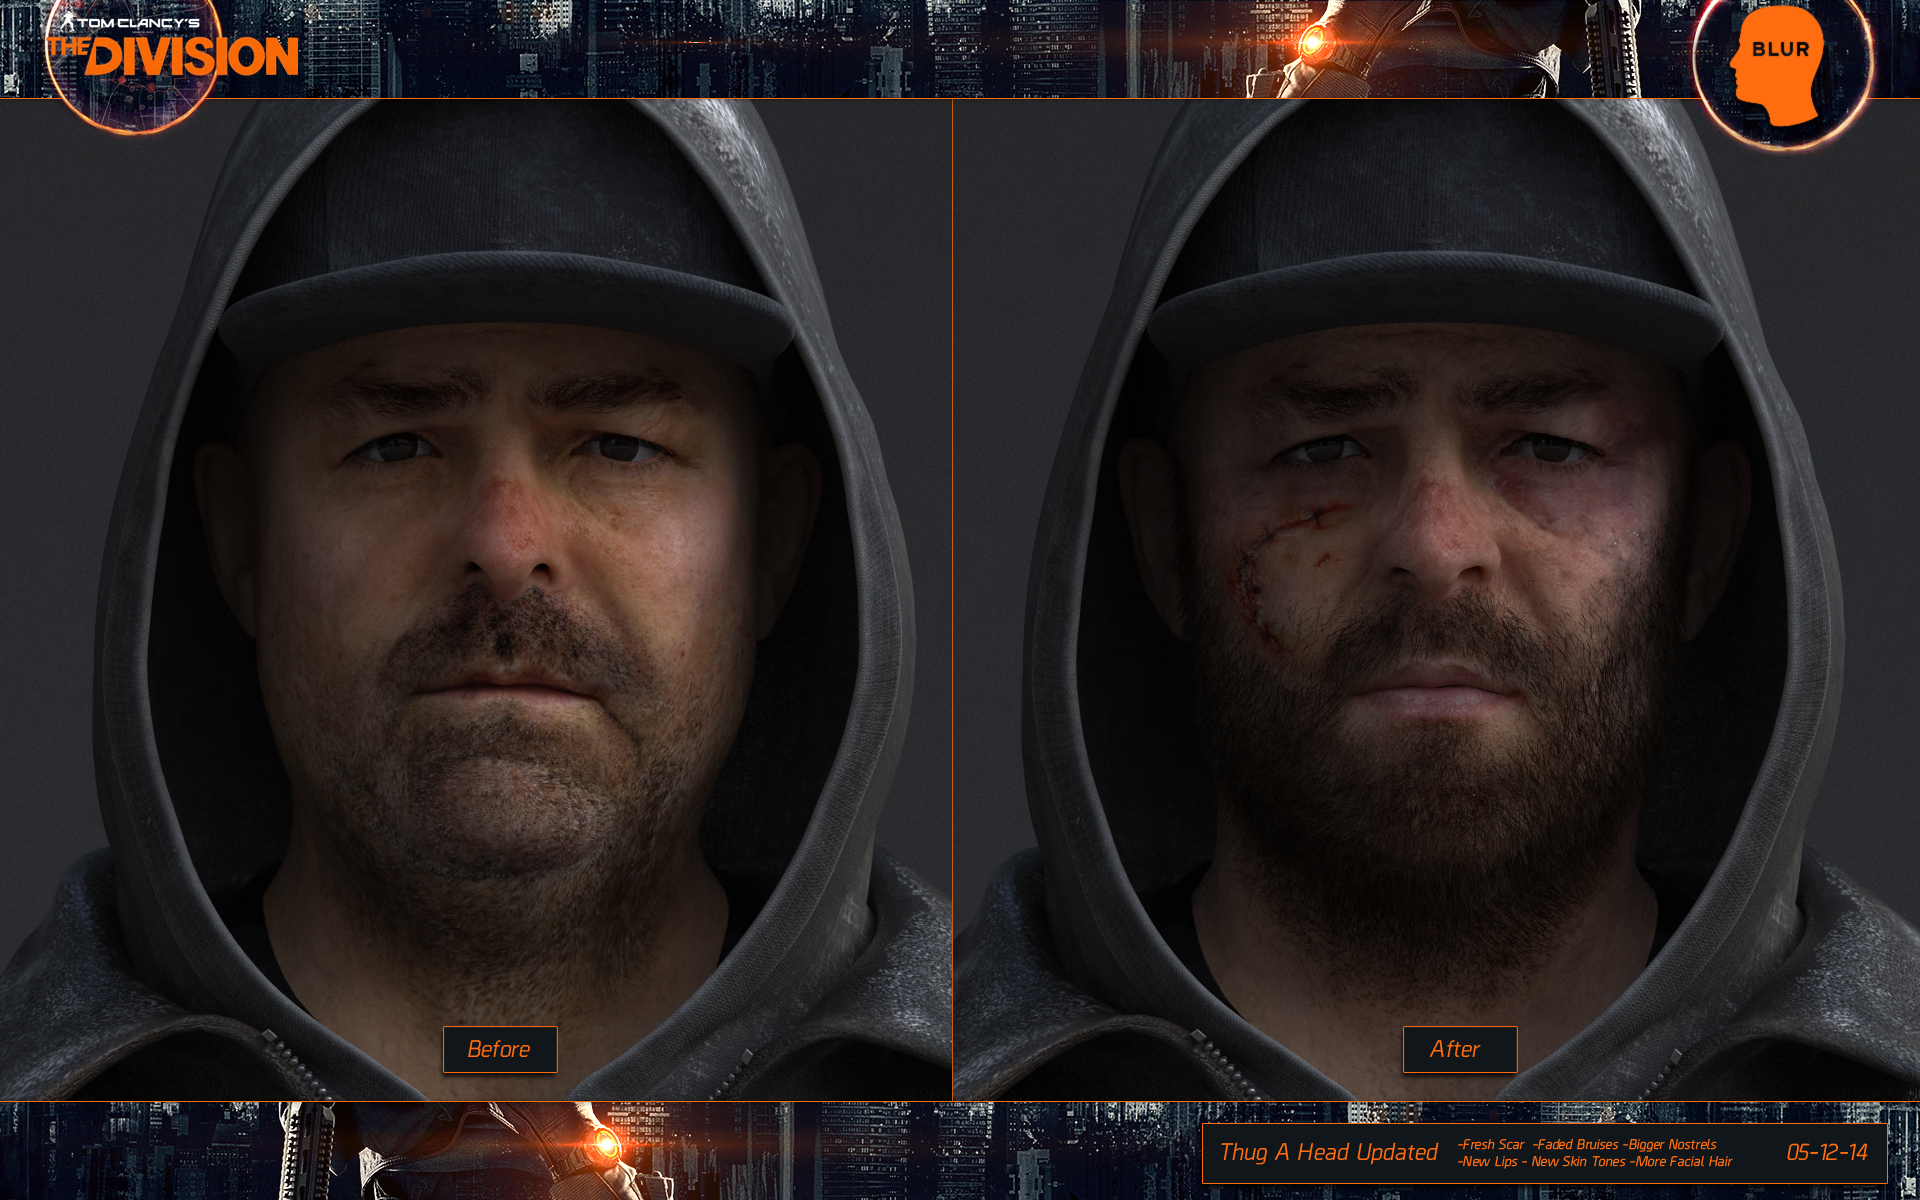 theDivision_ThugA_UpdatedHead.jpg